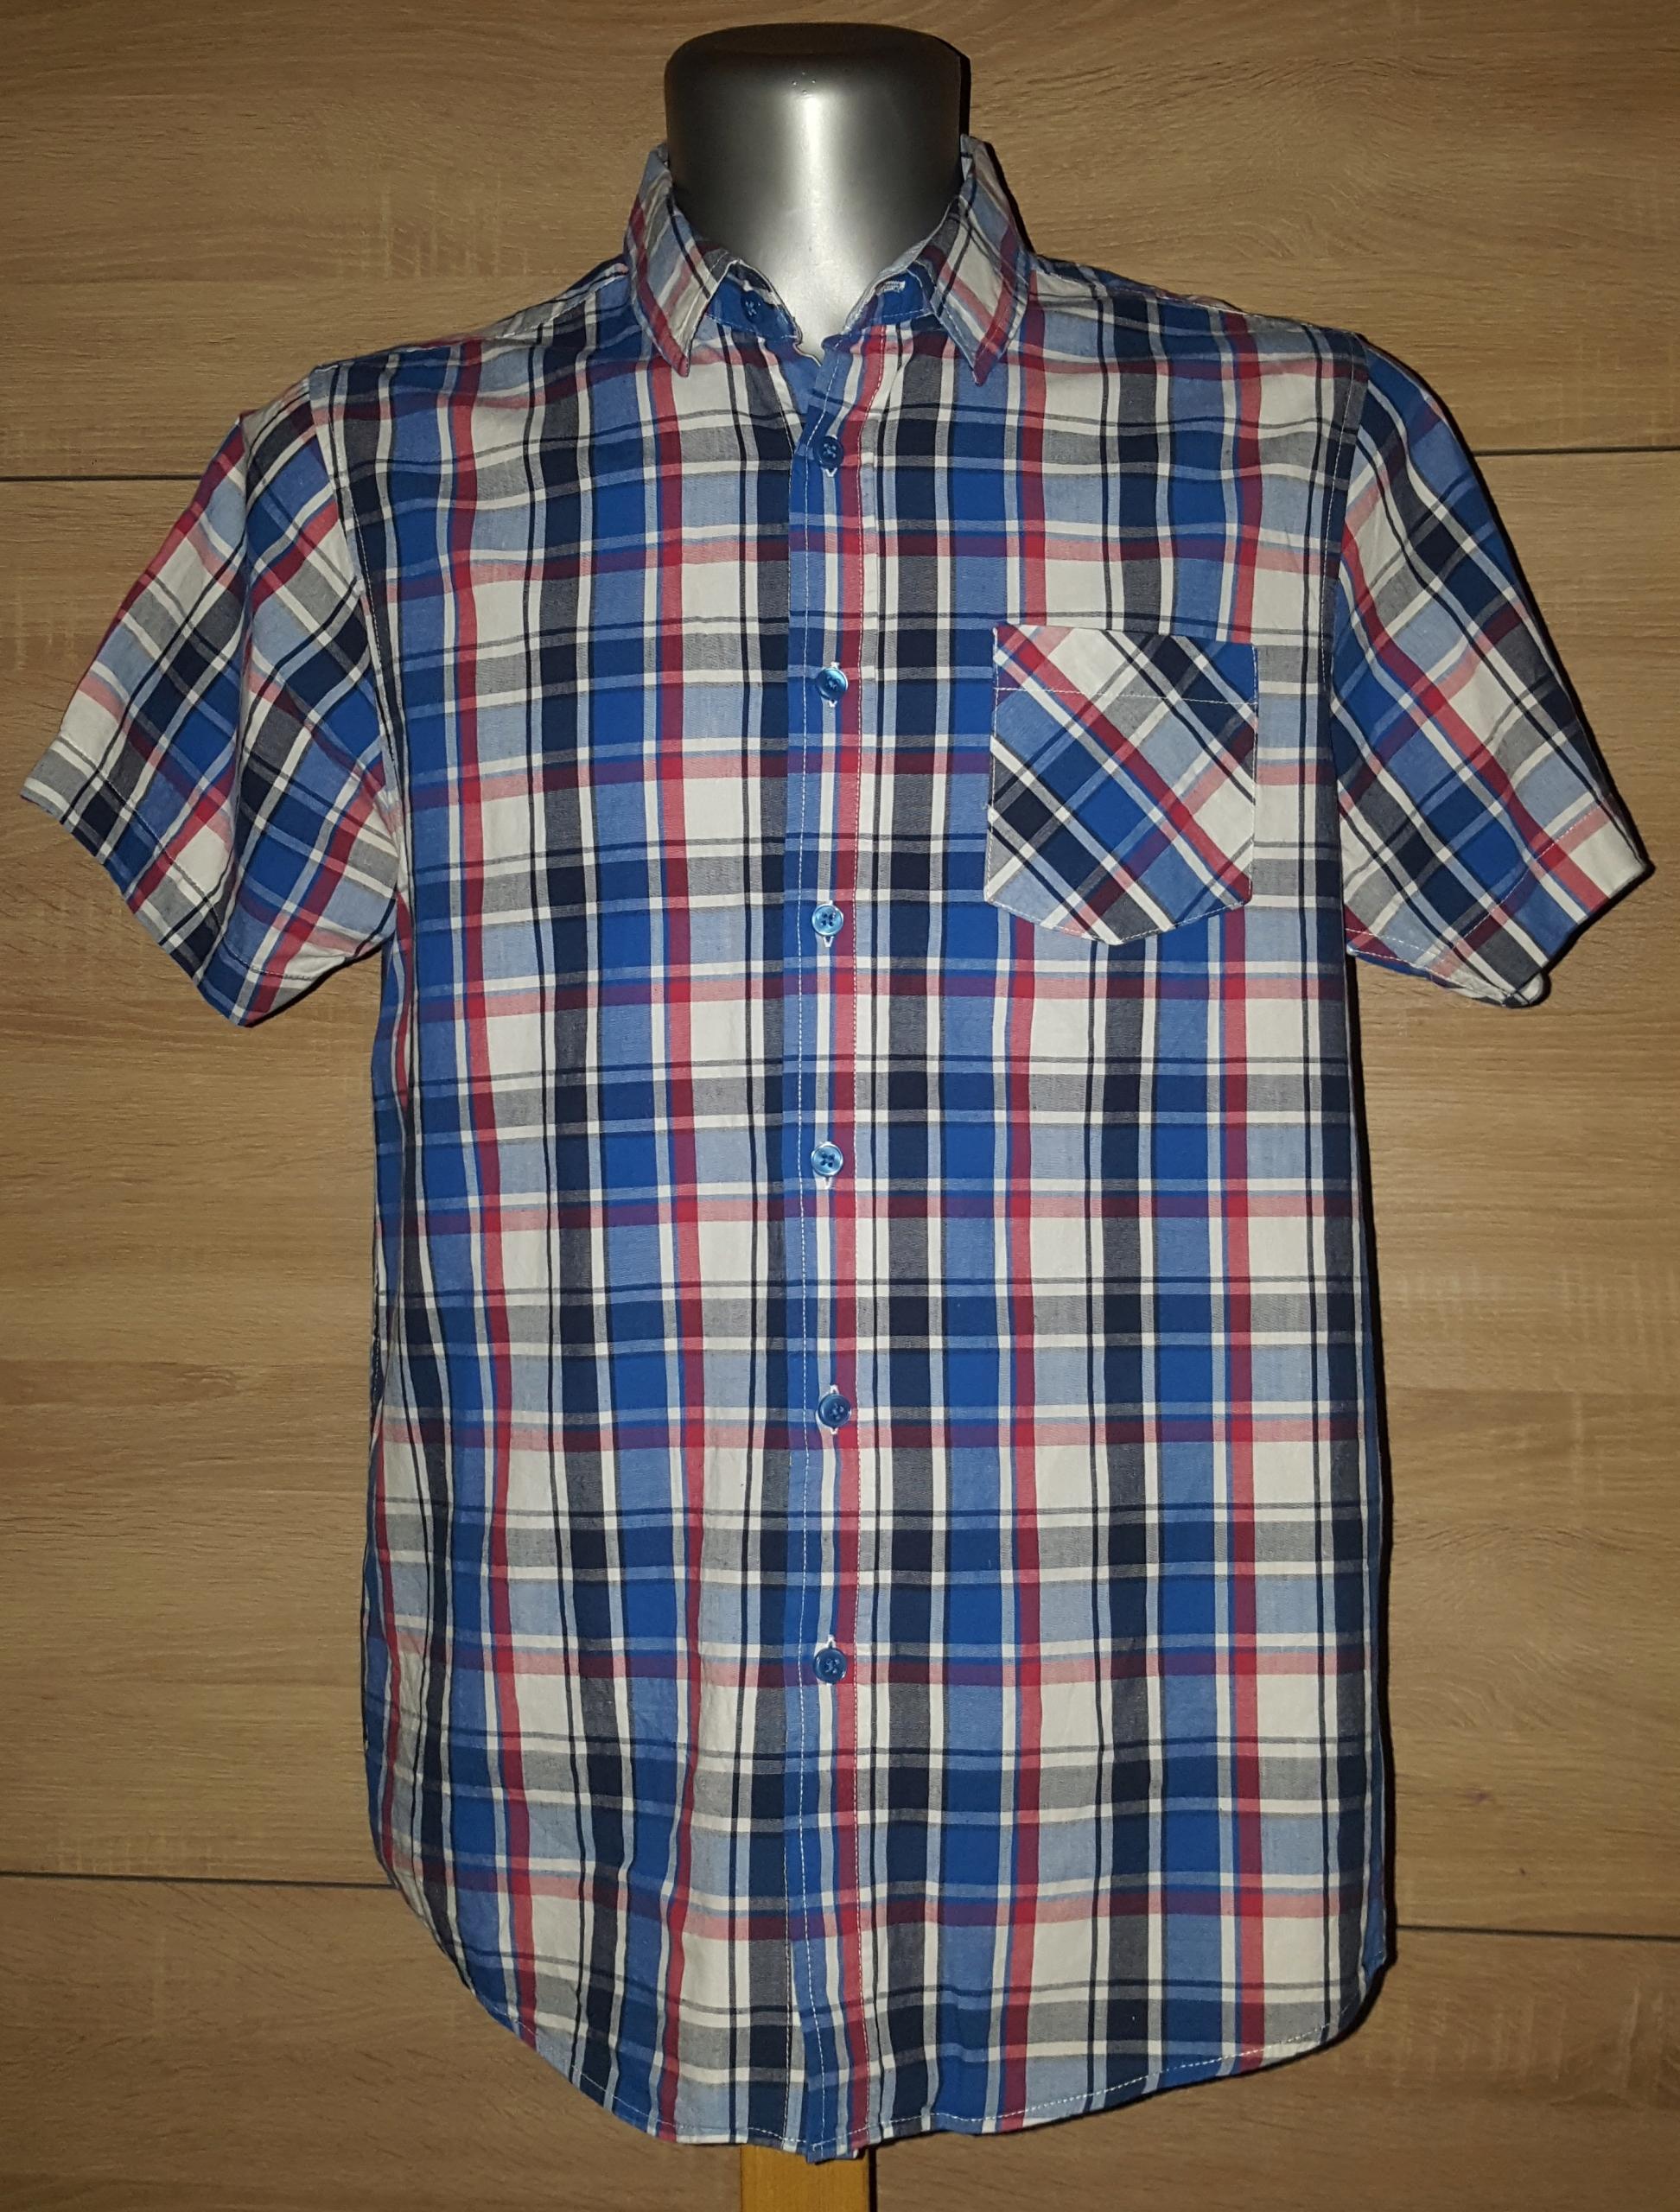 Koszula męska SOUL BRAND rozmiar L.